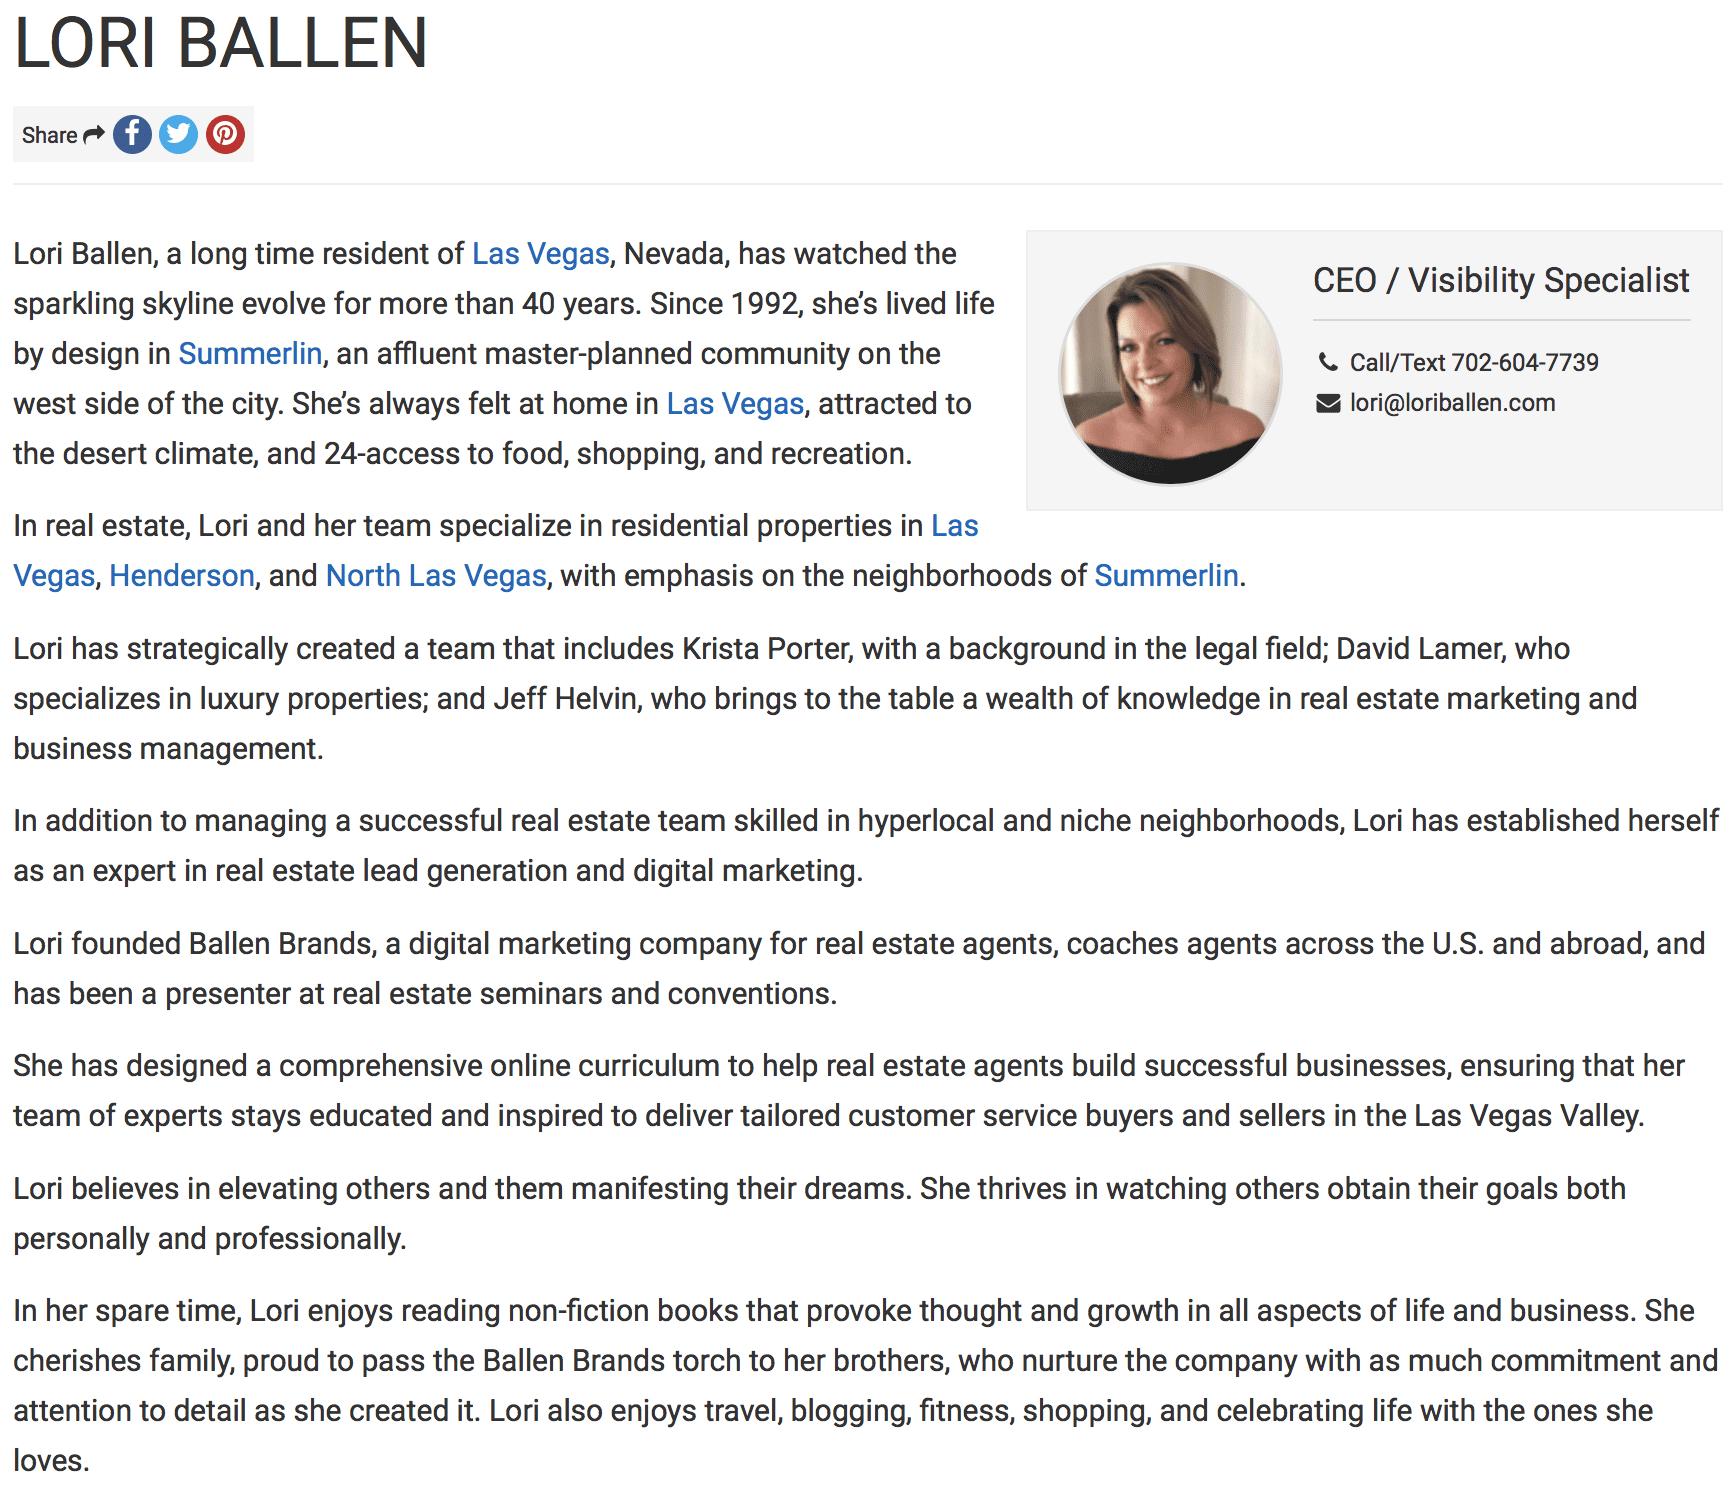 Lori Ballen is a real estate agent in las Vegas, NV